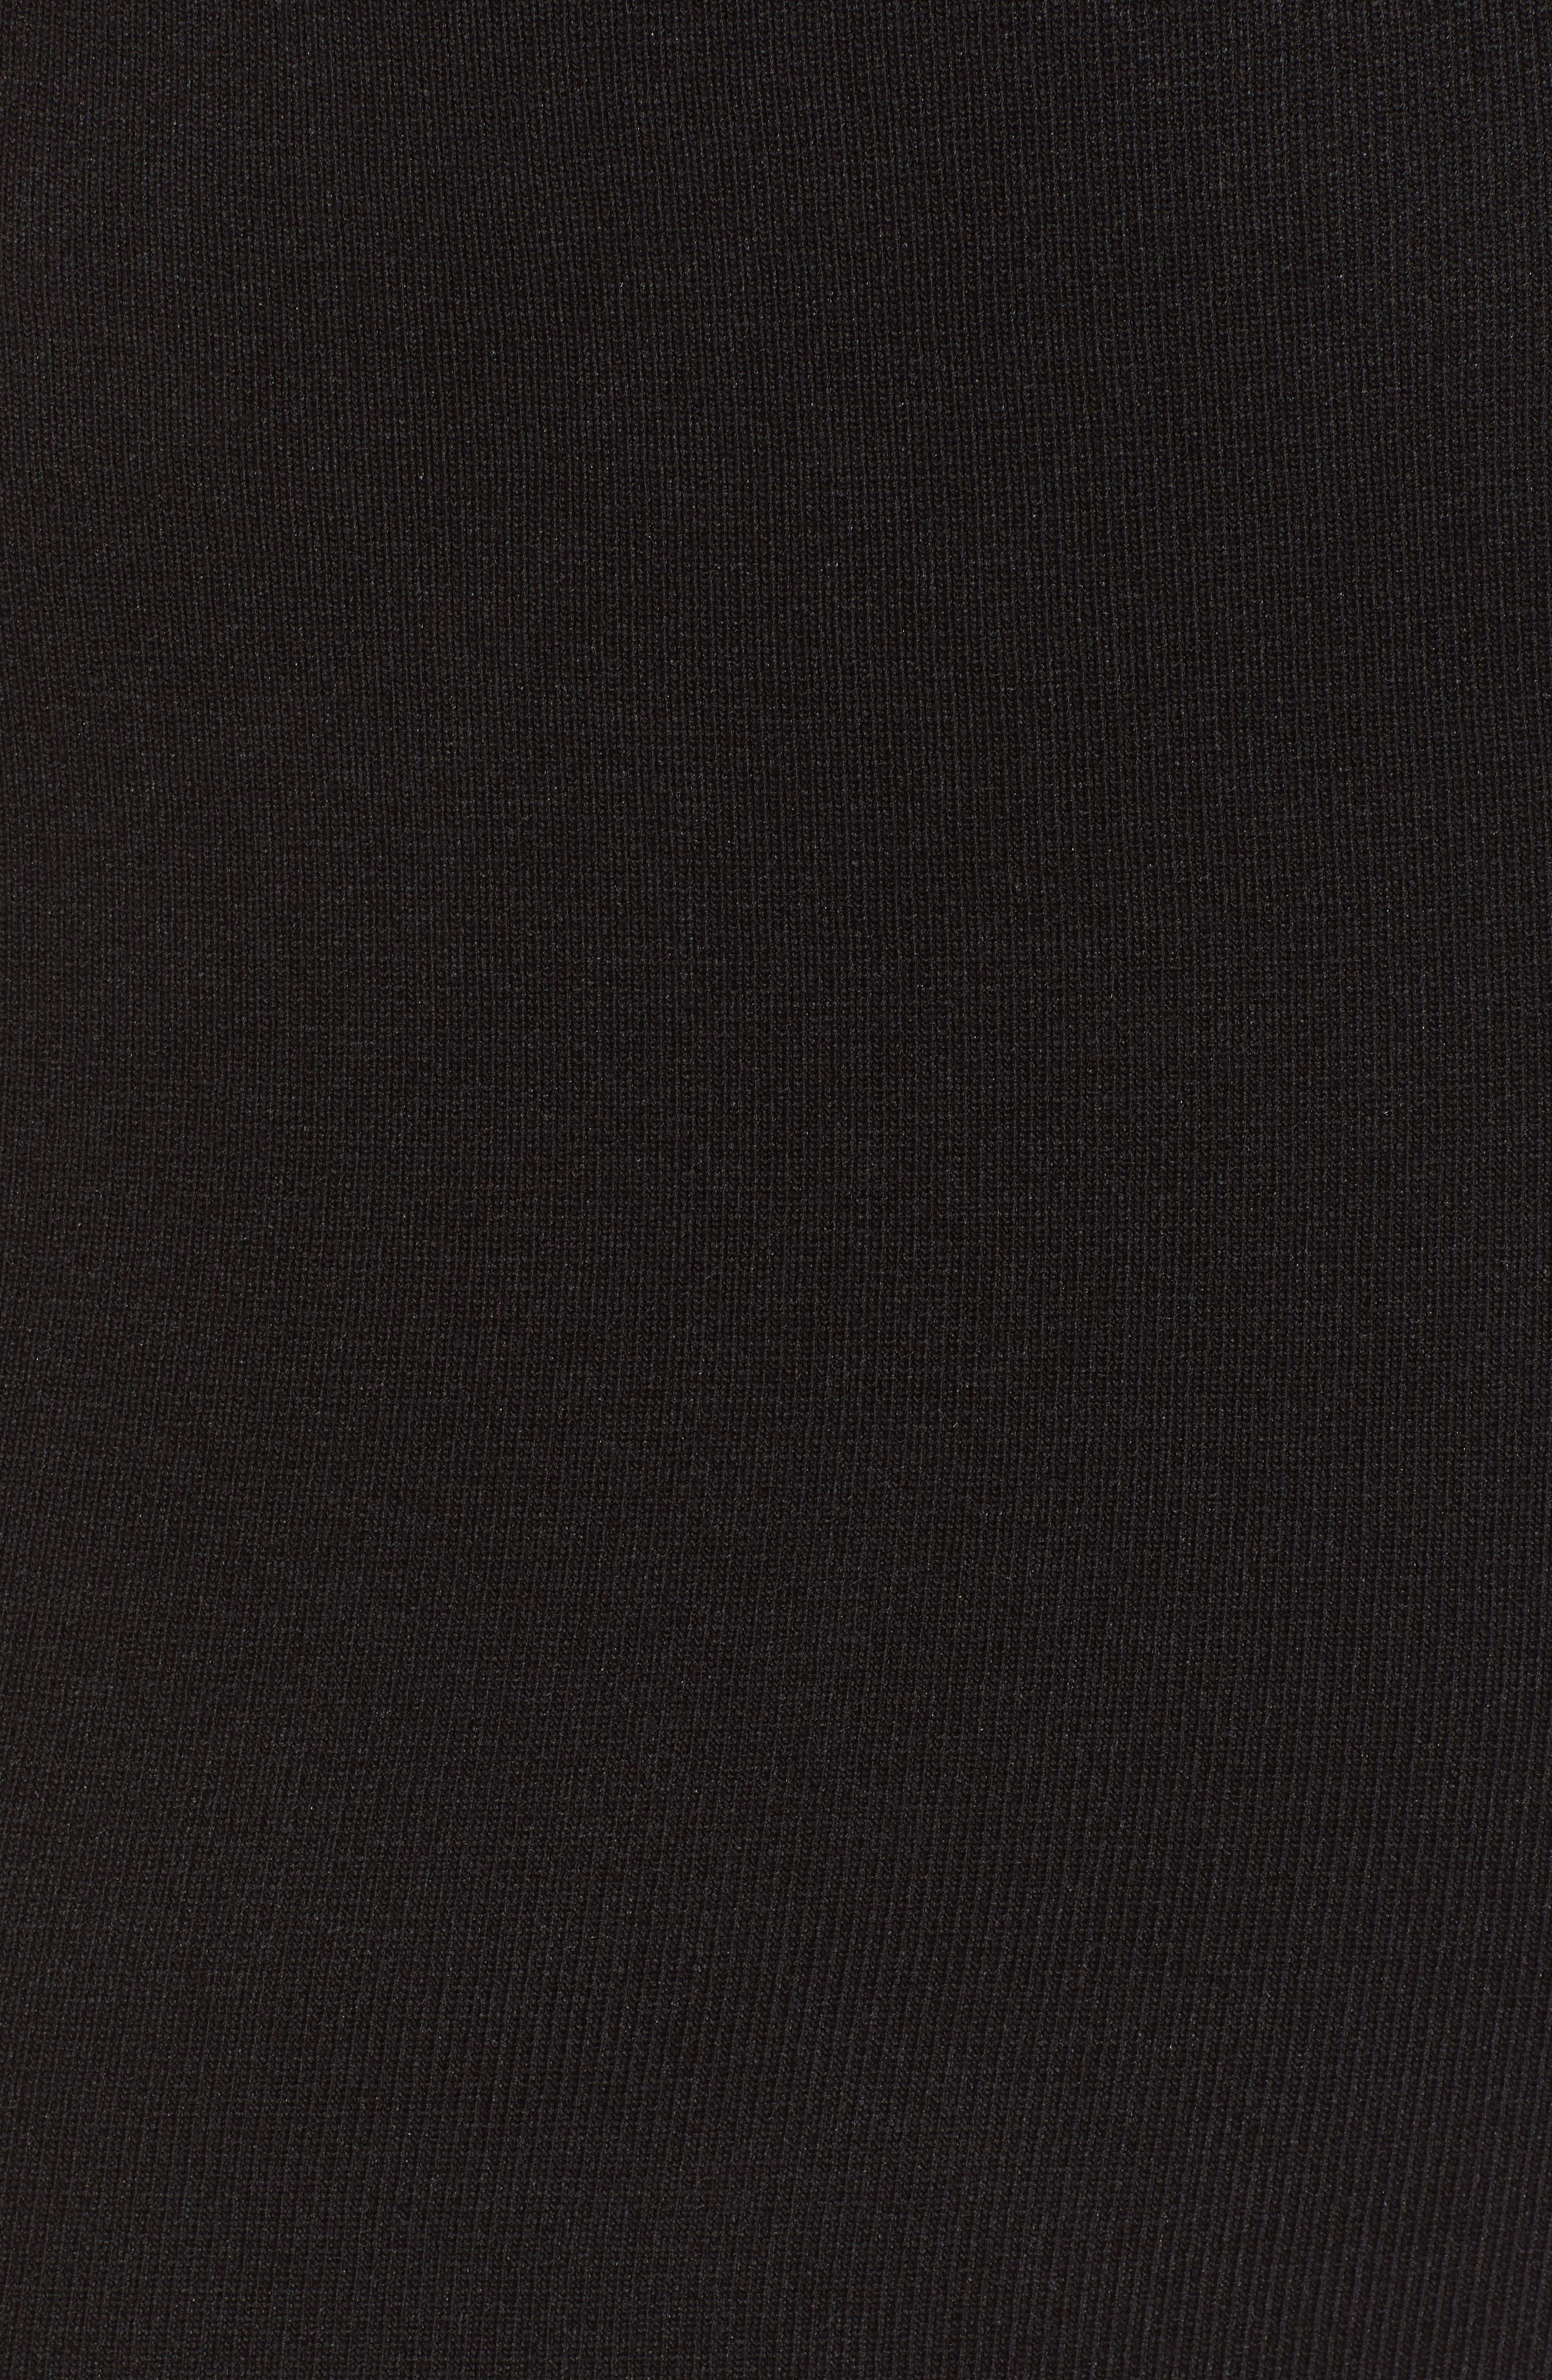 Off the Shoulder Sweater Dress,                             Alternate thumbnail 6, color,                             BLACK